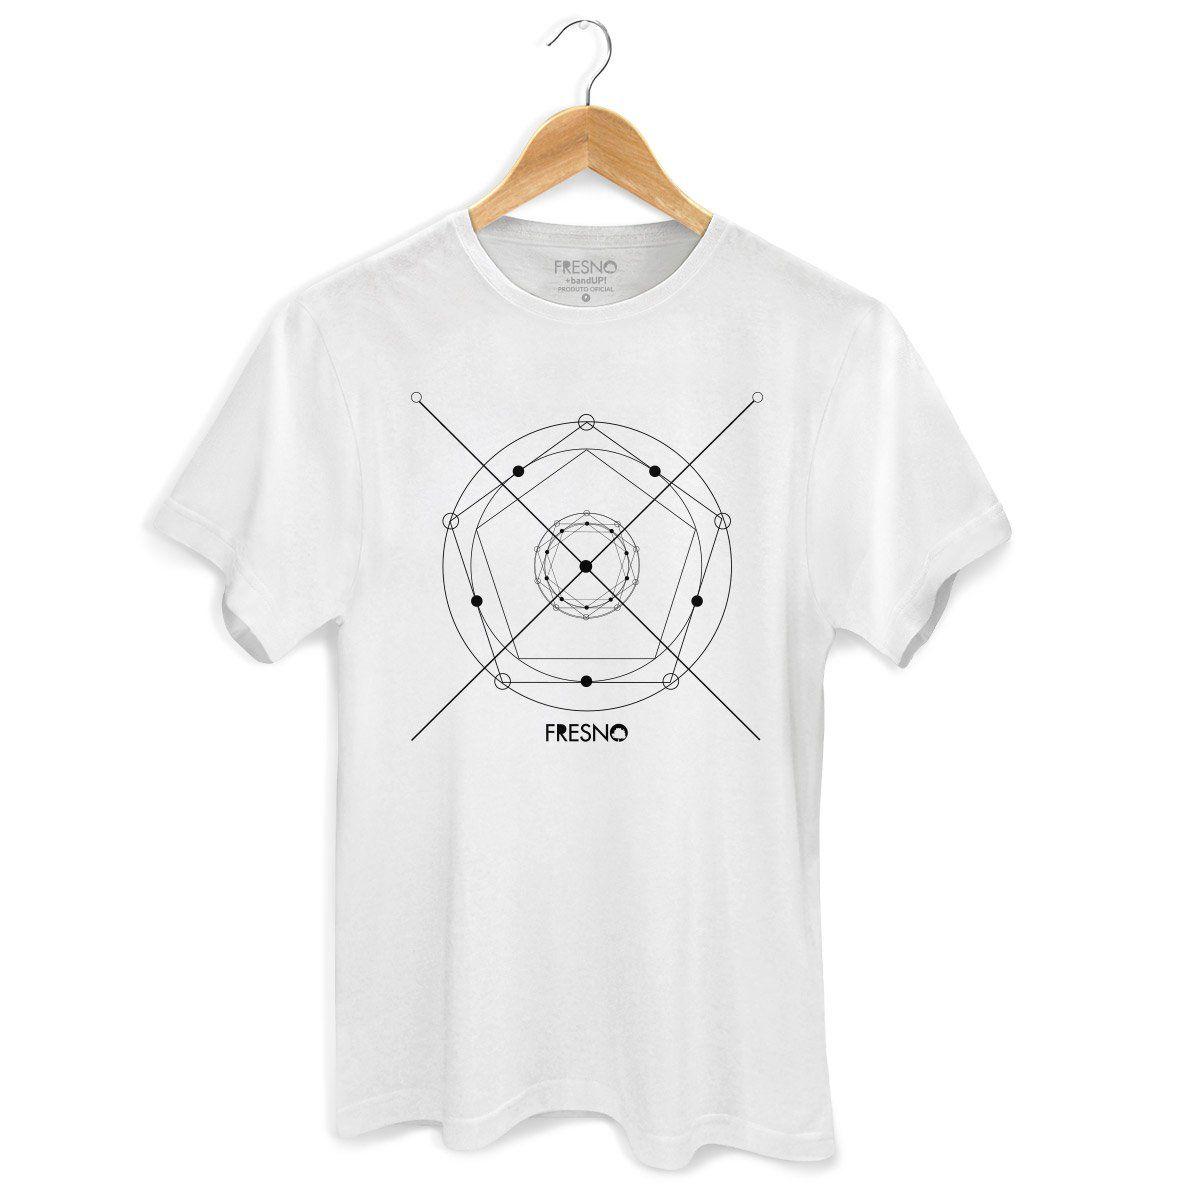 Camiseta Masculina Fresno Diagrama